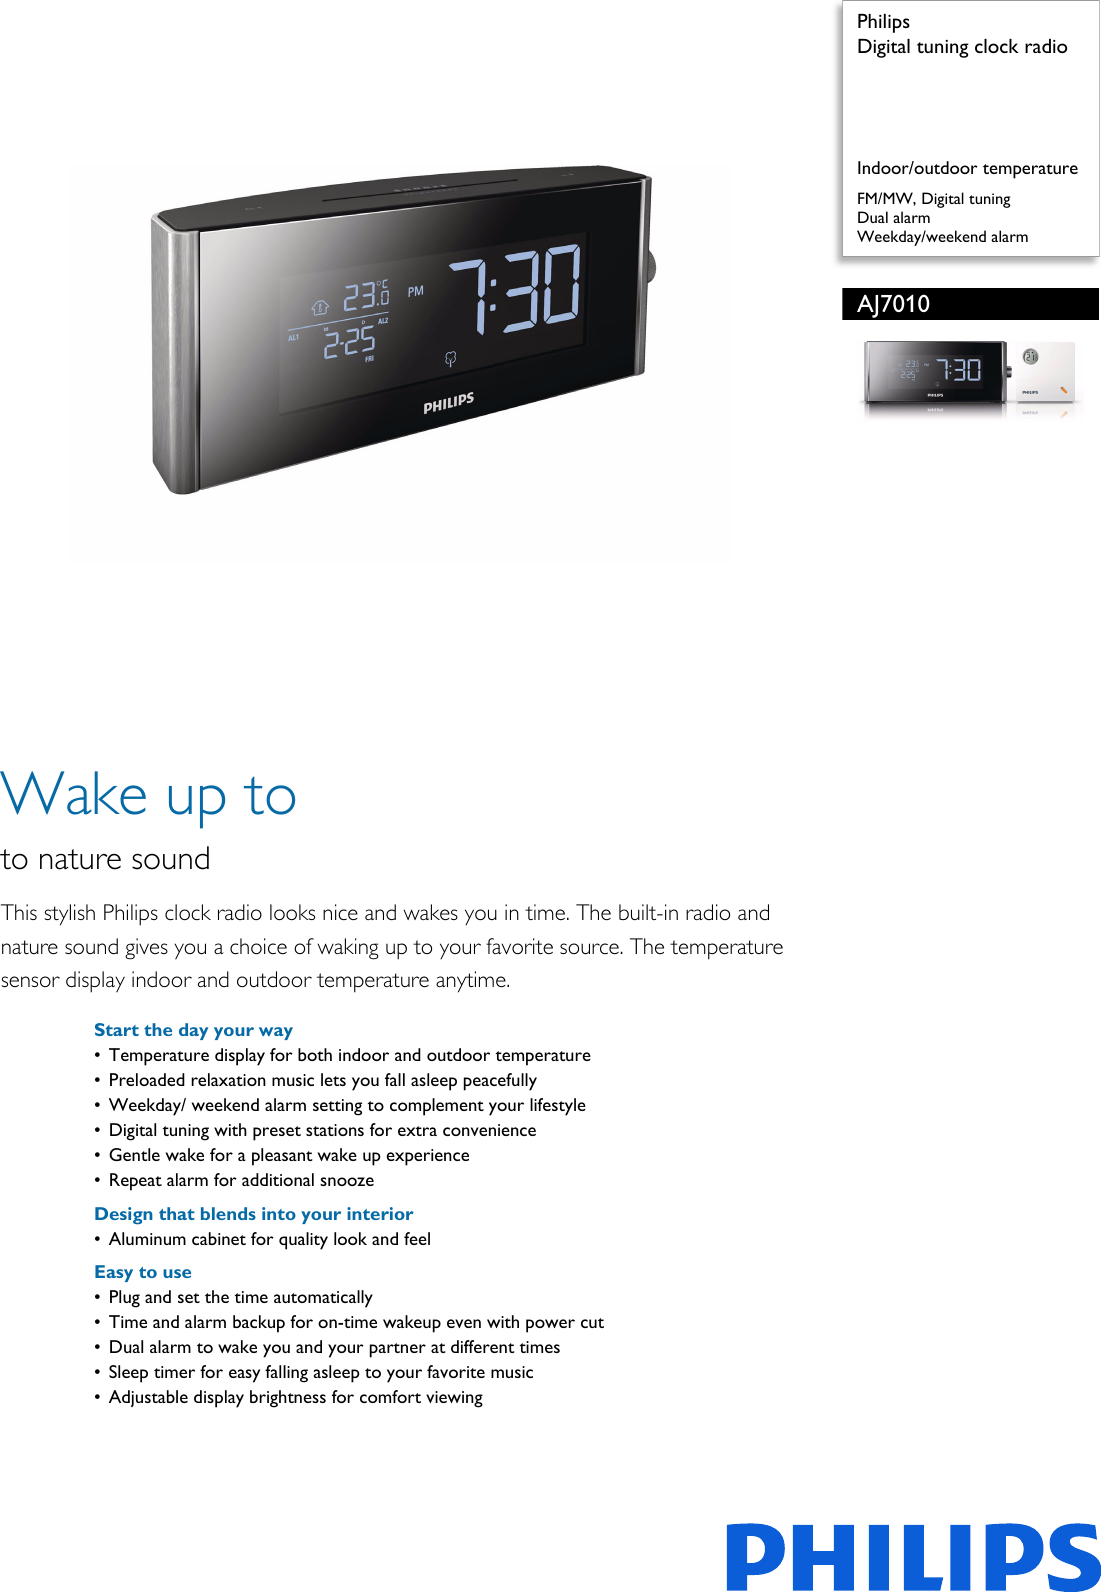 Tax & Exchange 7 Colors Ca Fine Quality Office Casio Jw-200sc 12-digit Desktop Calculator